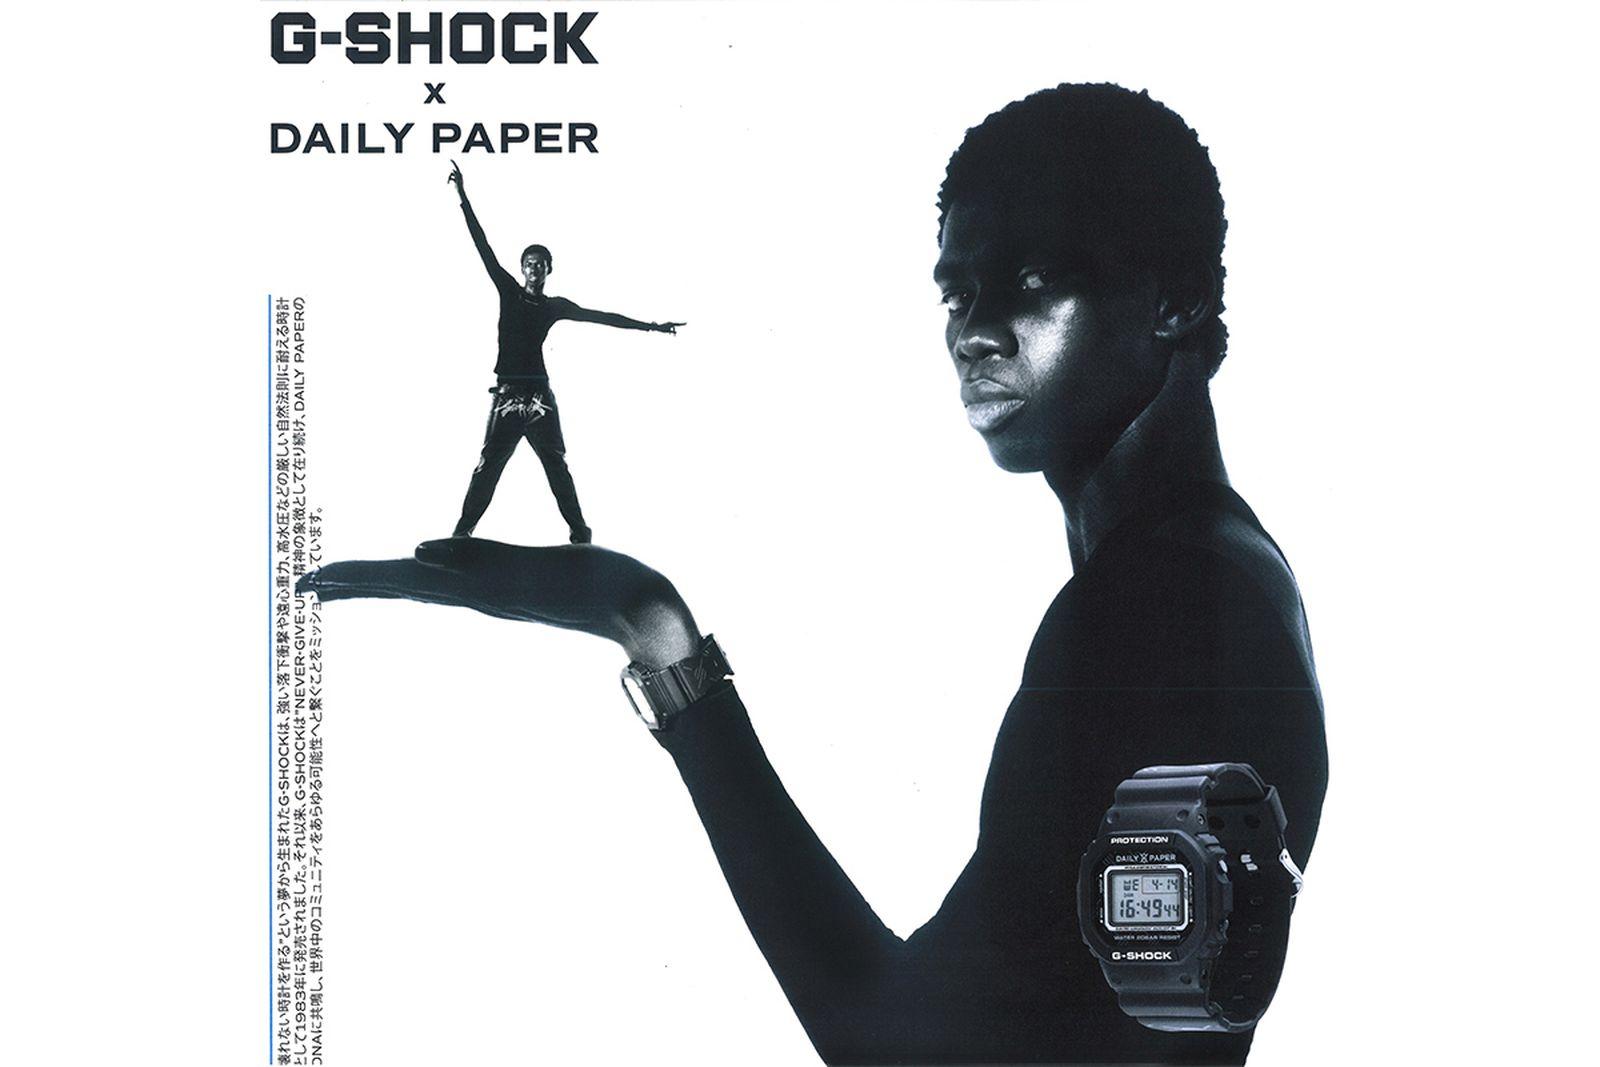 gshock-dailypaper-5